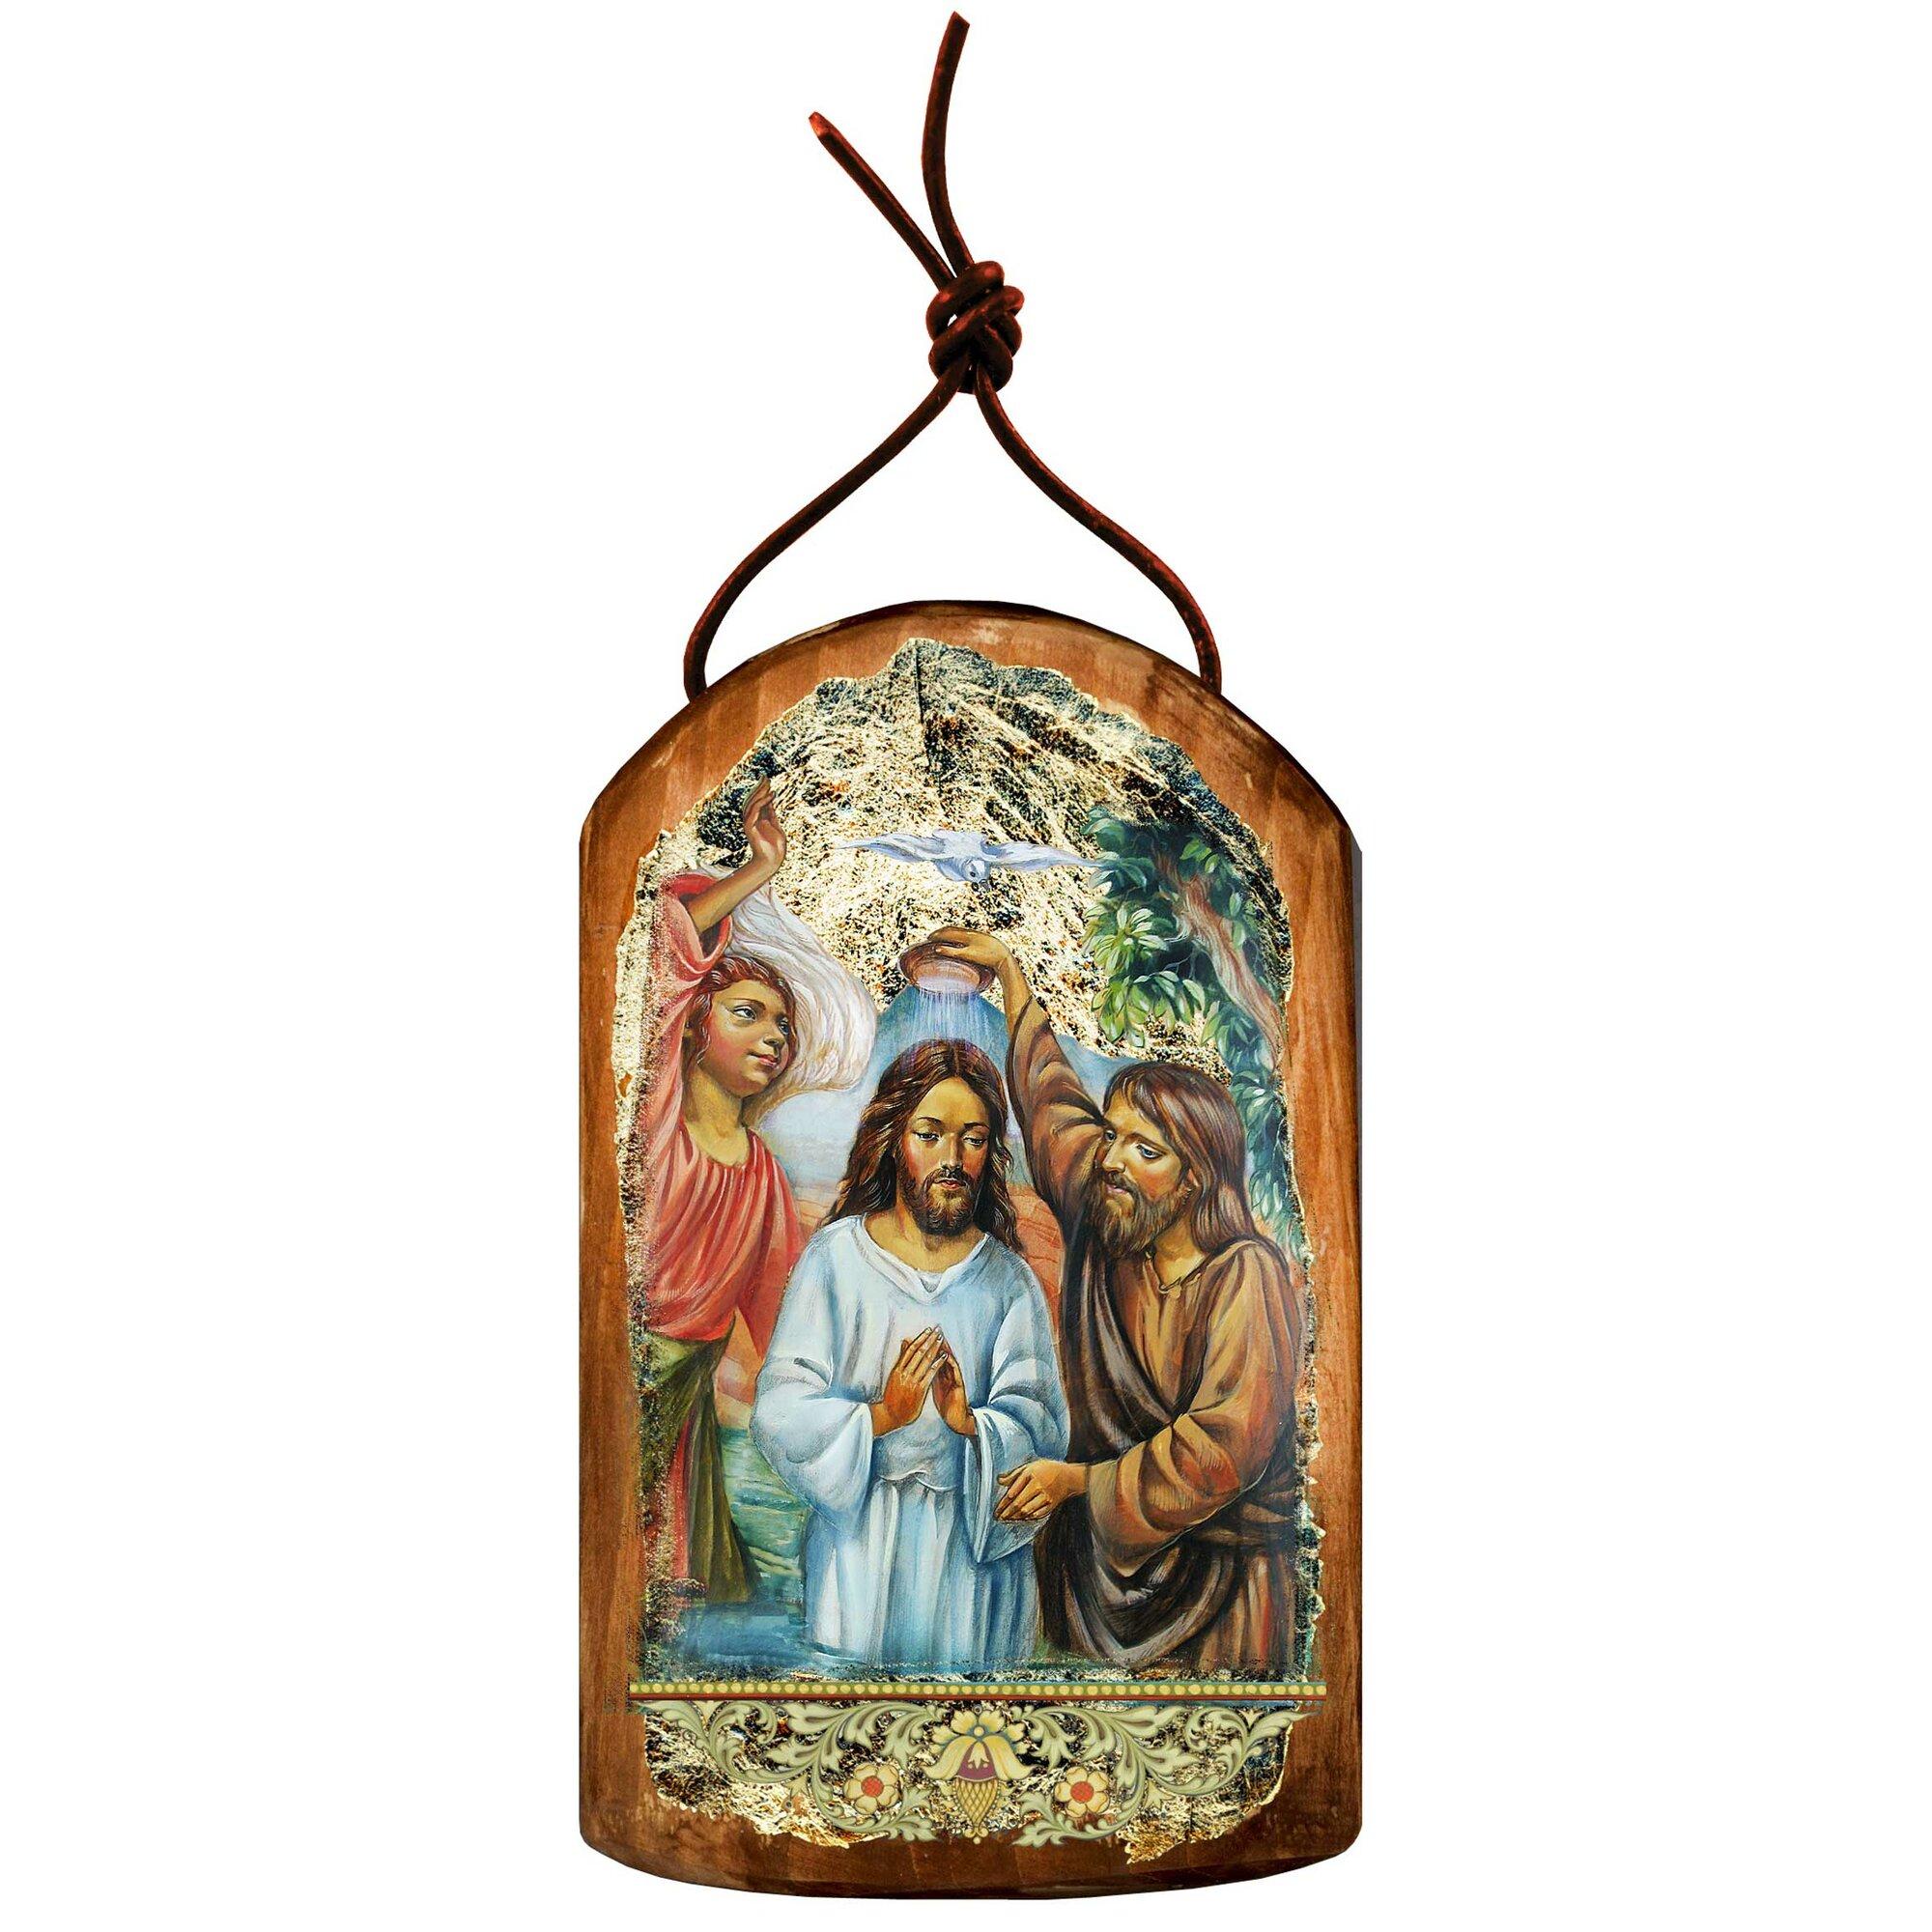 Baptism Ornaments Christening Christmas Ornaments: G Debrekht Inspirational Icon Christening Wooden Ornament